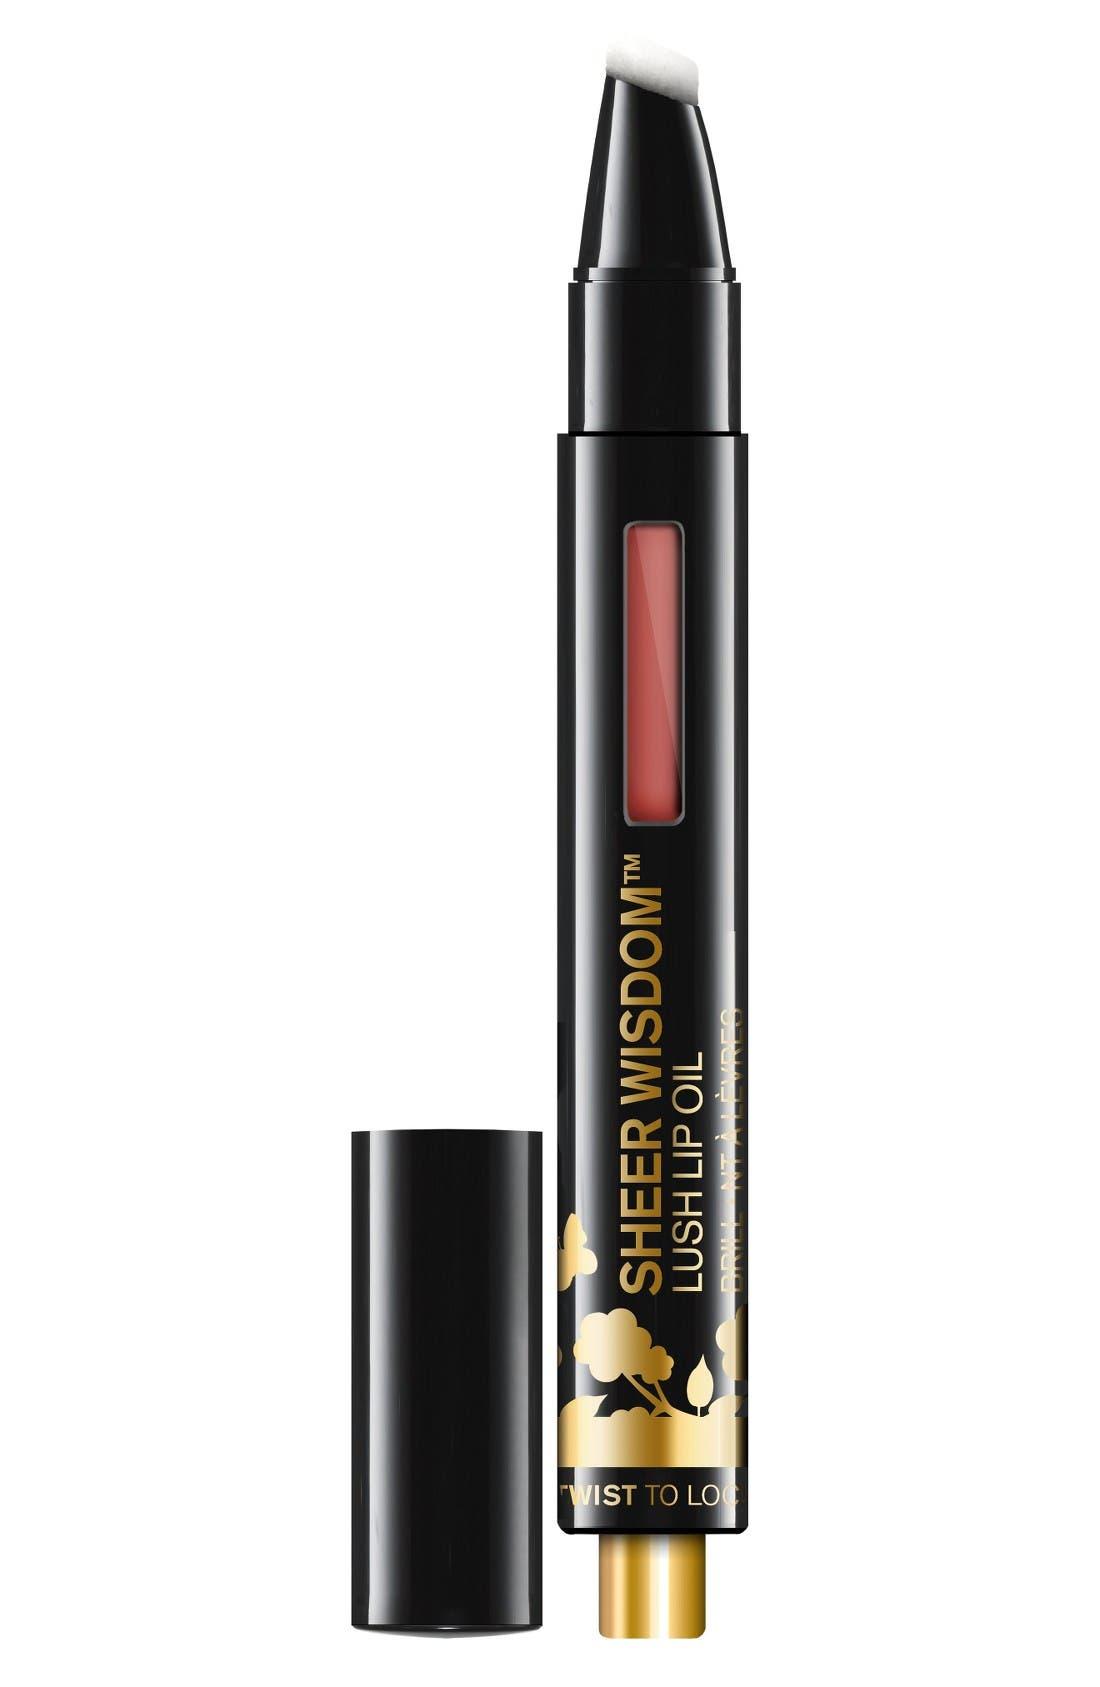 Sheer Wisdom Lip Oil,                             Main thumbnail 1, color,                             Cinnamon Spice